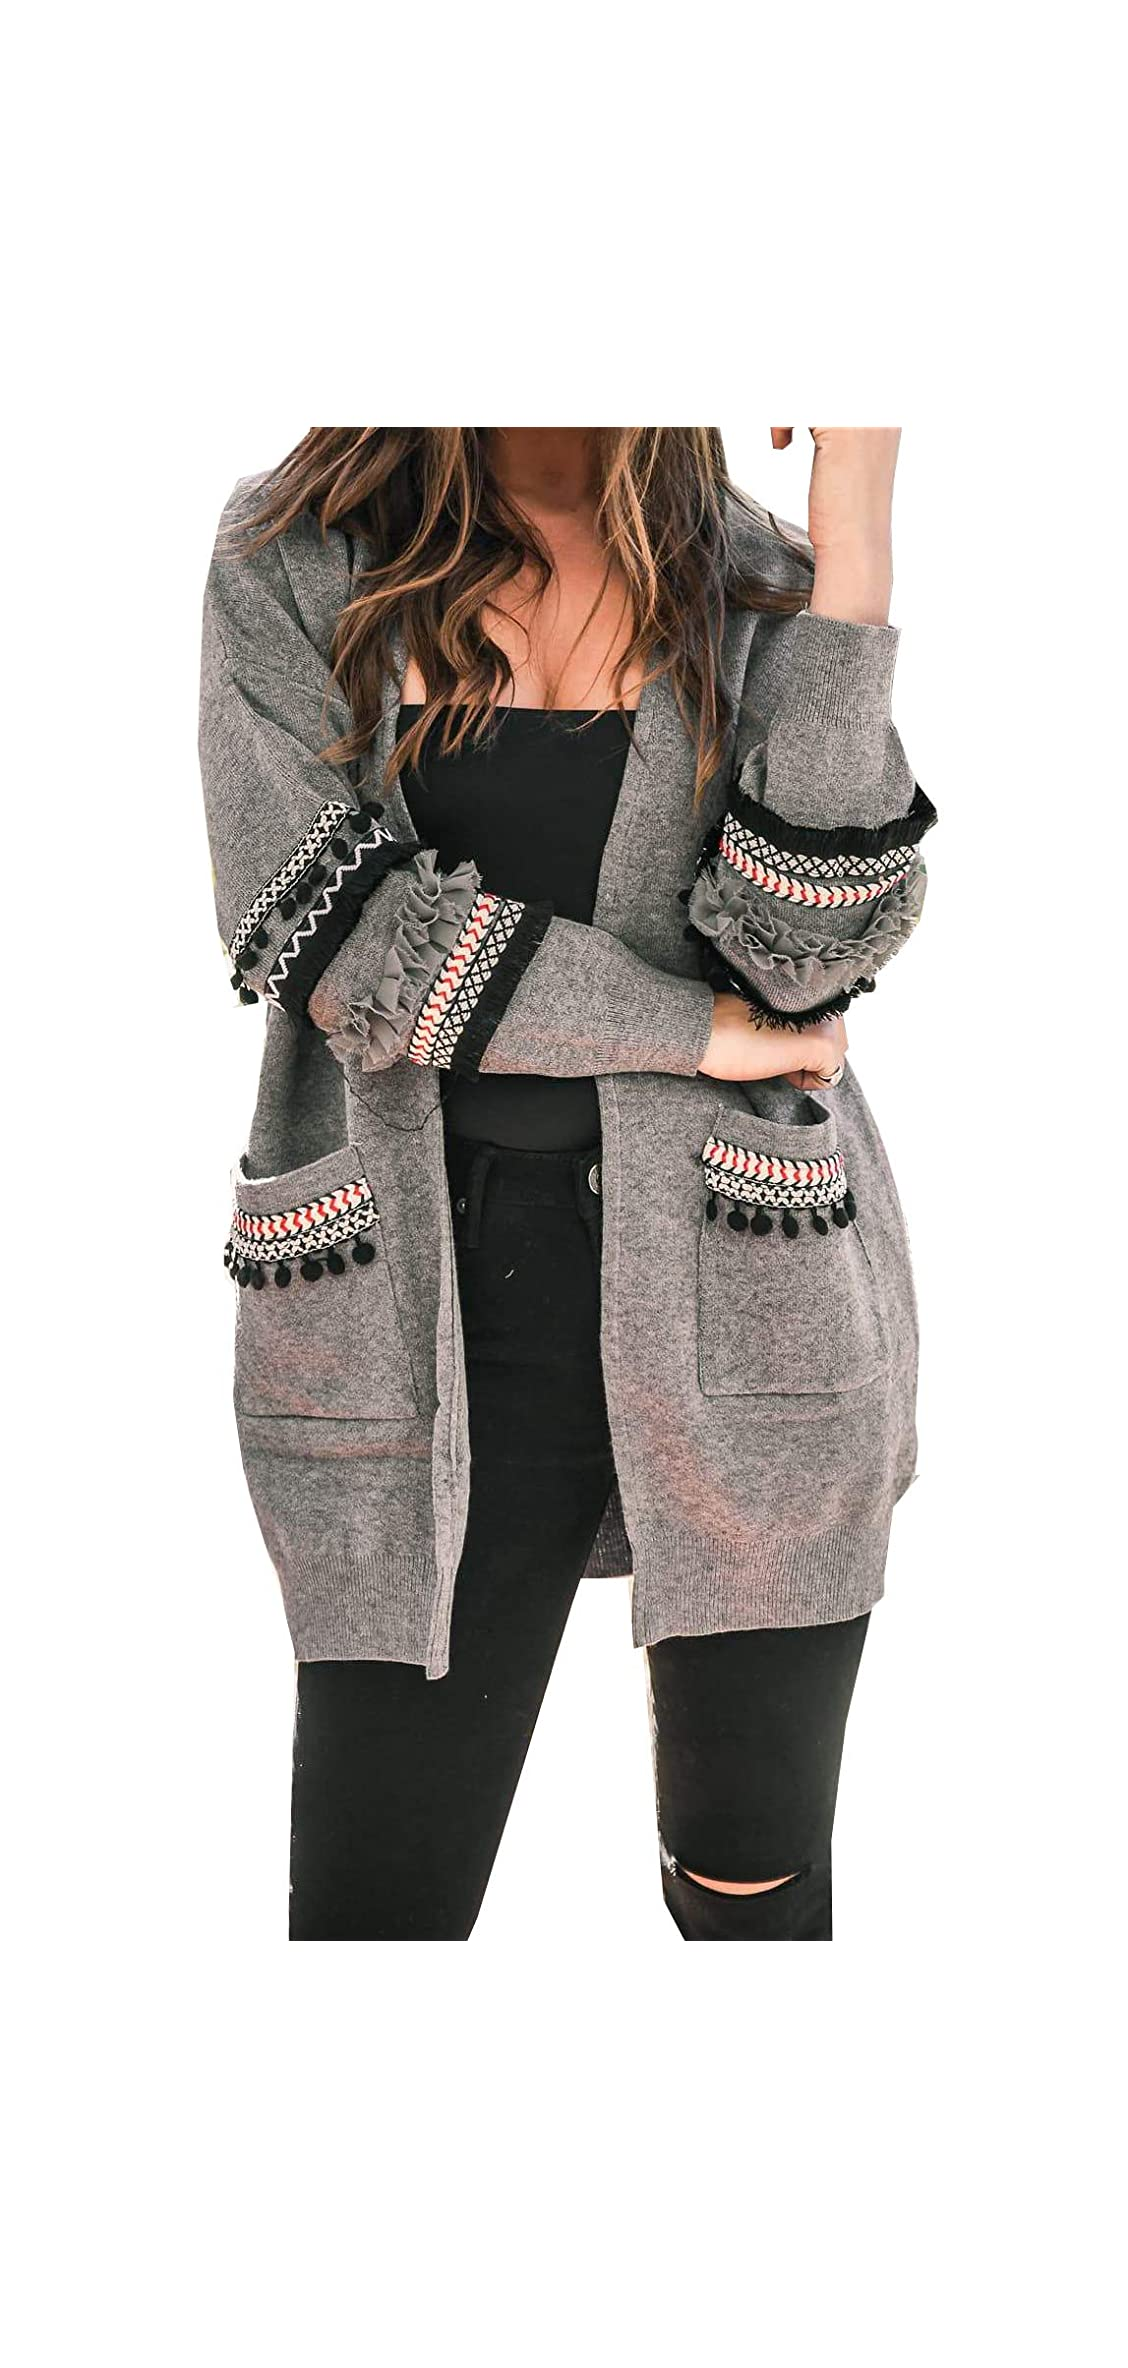 Women Boho Long Sleeve Open Front Knit Cardigan With Coat